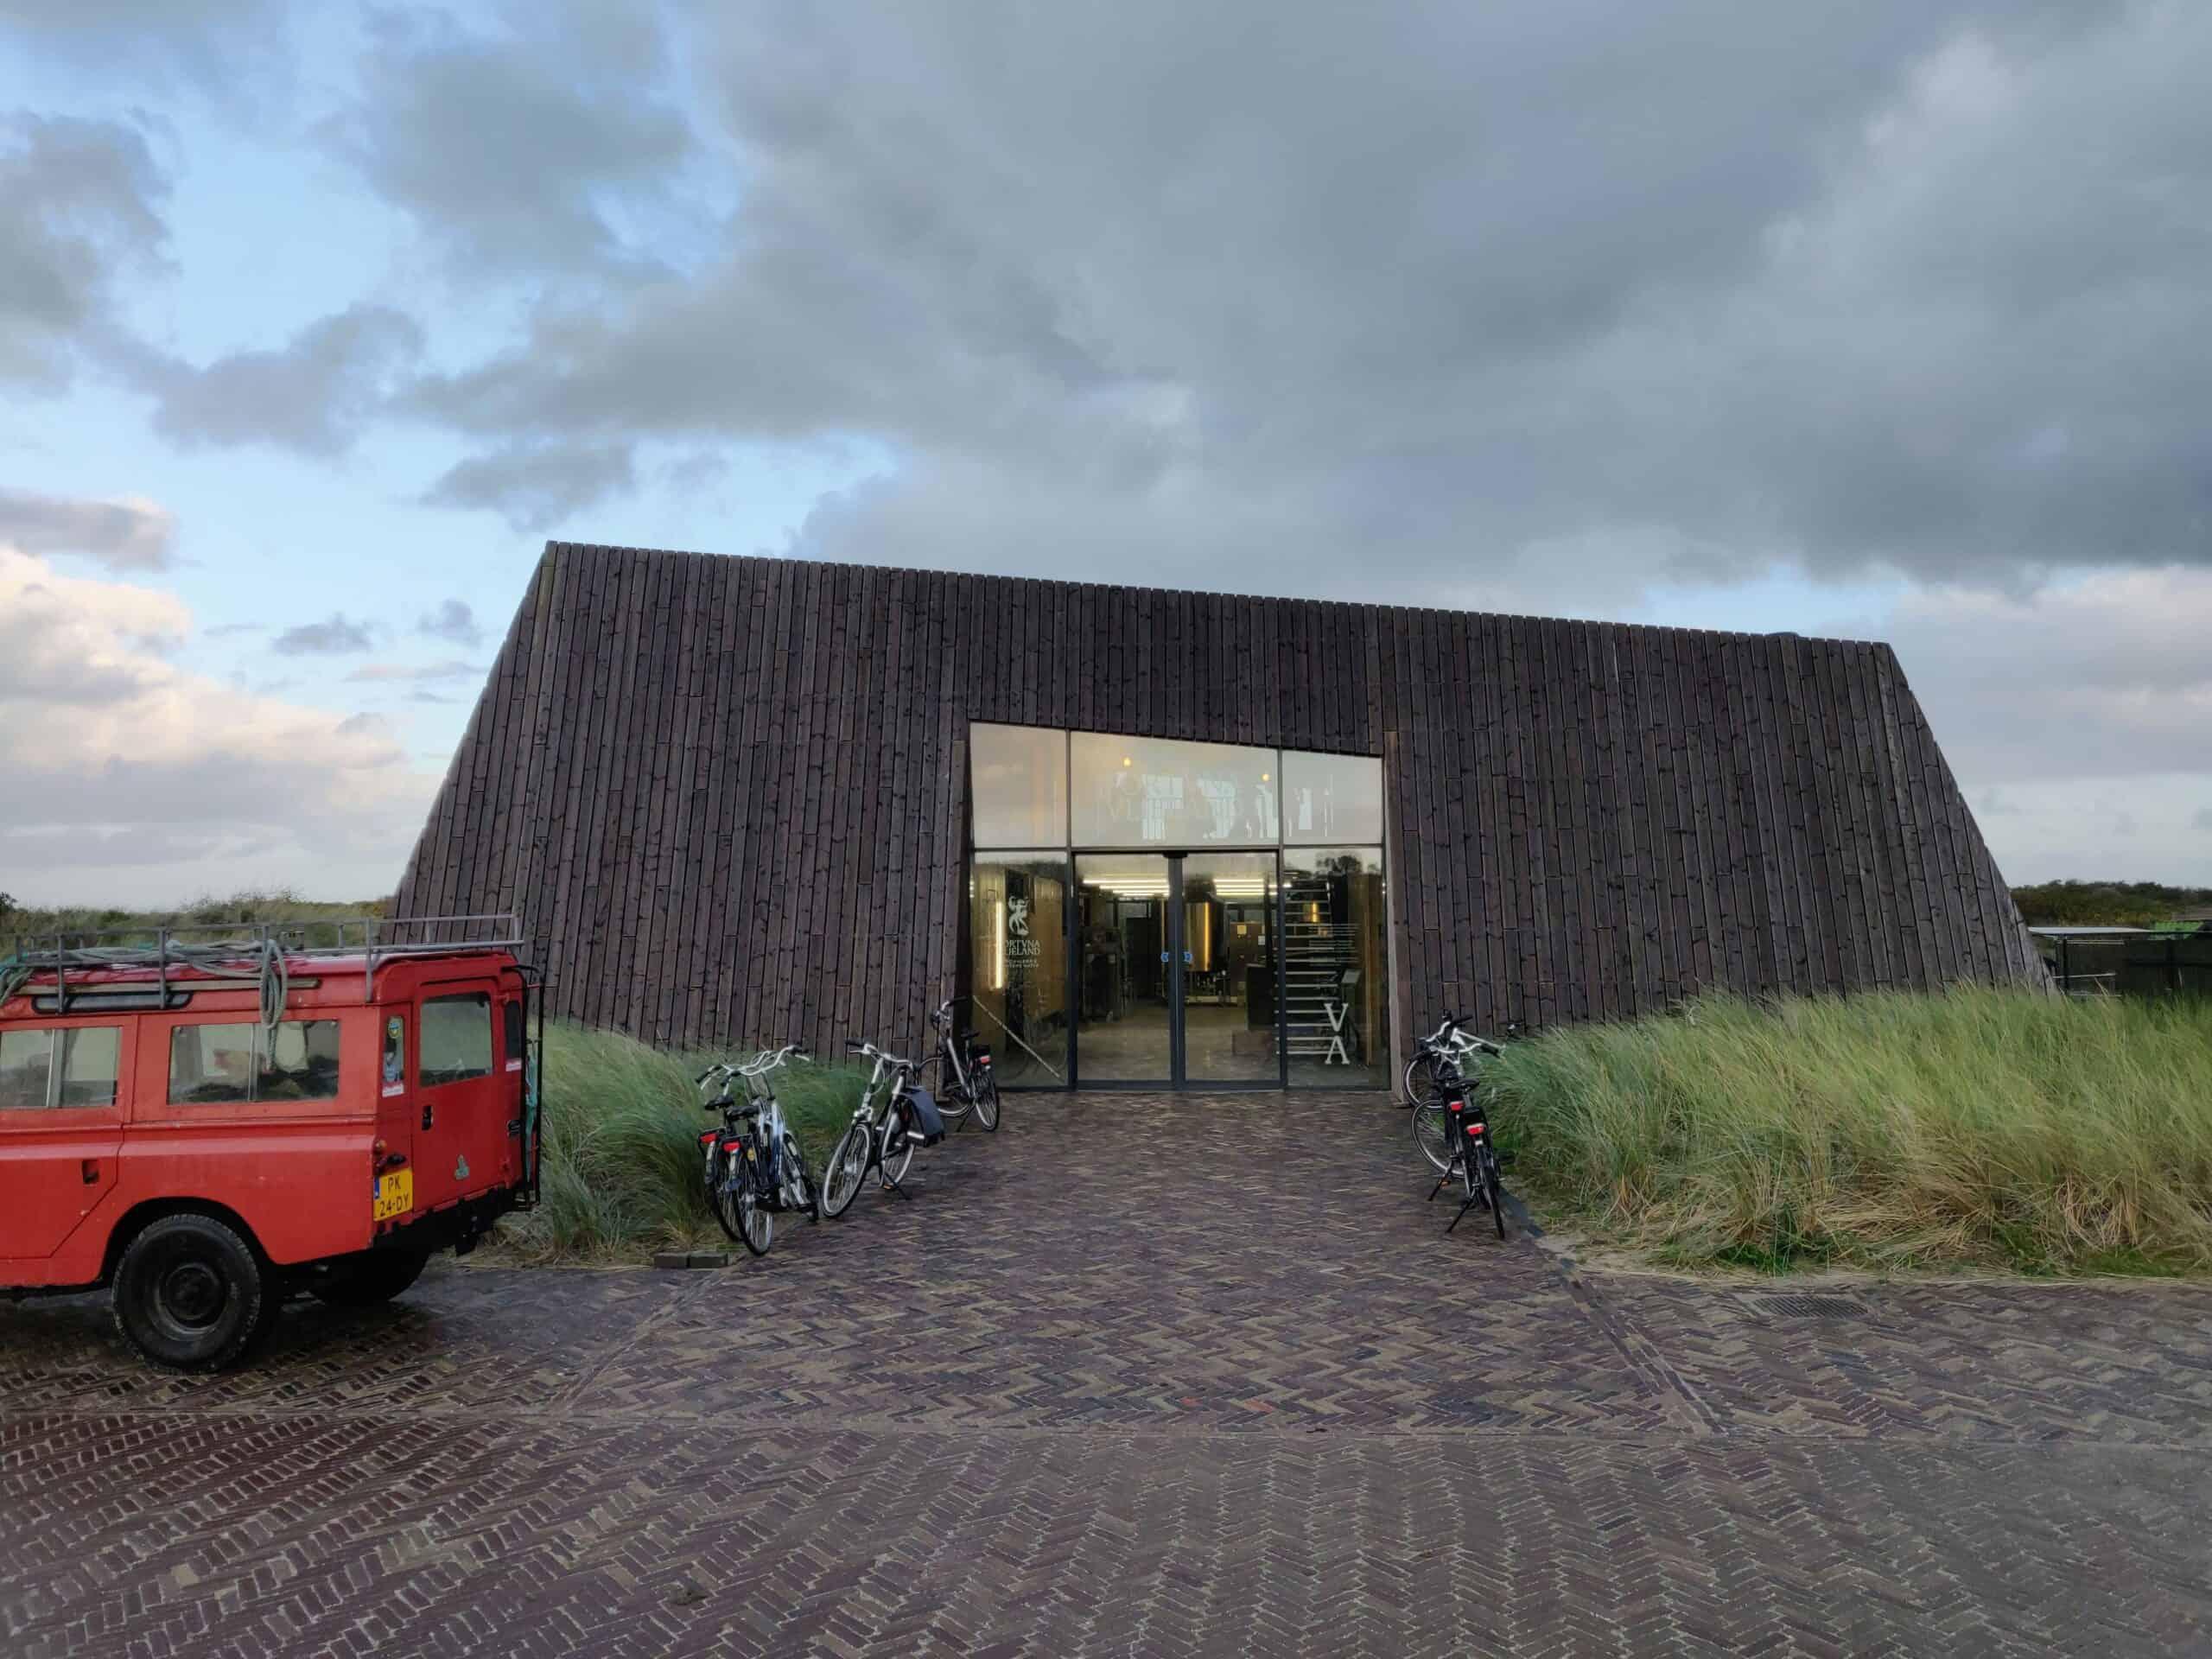 Fortuna Vlieland